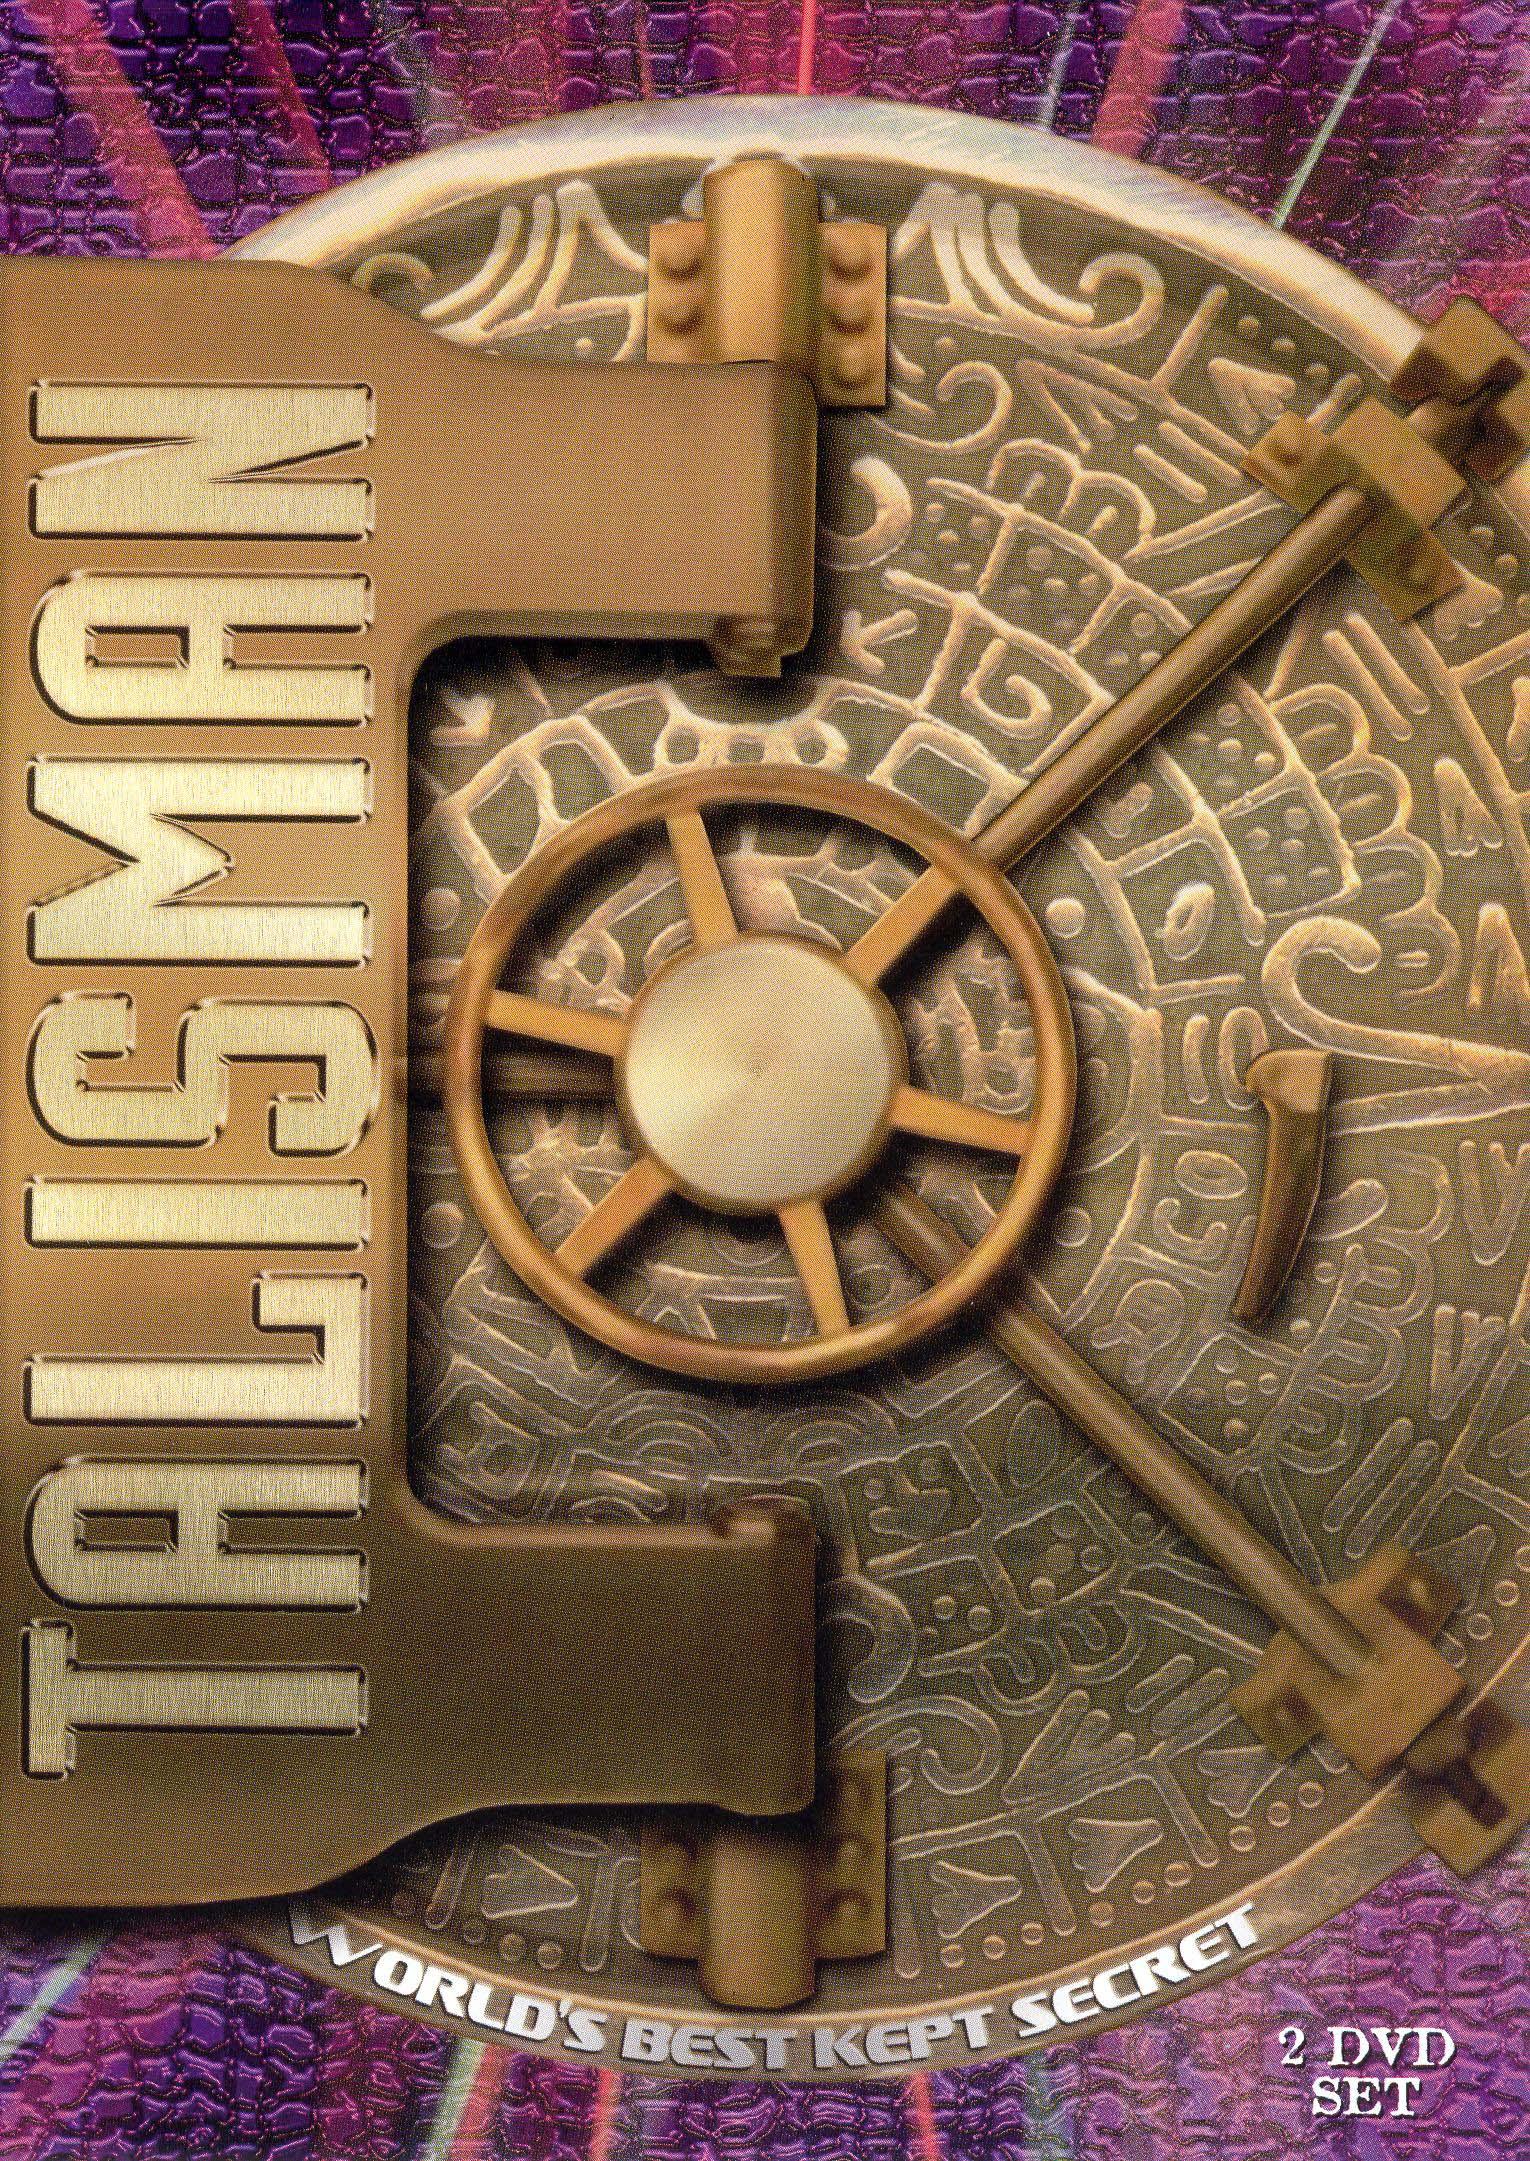 Talisman: The World's Best Kept Secret